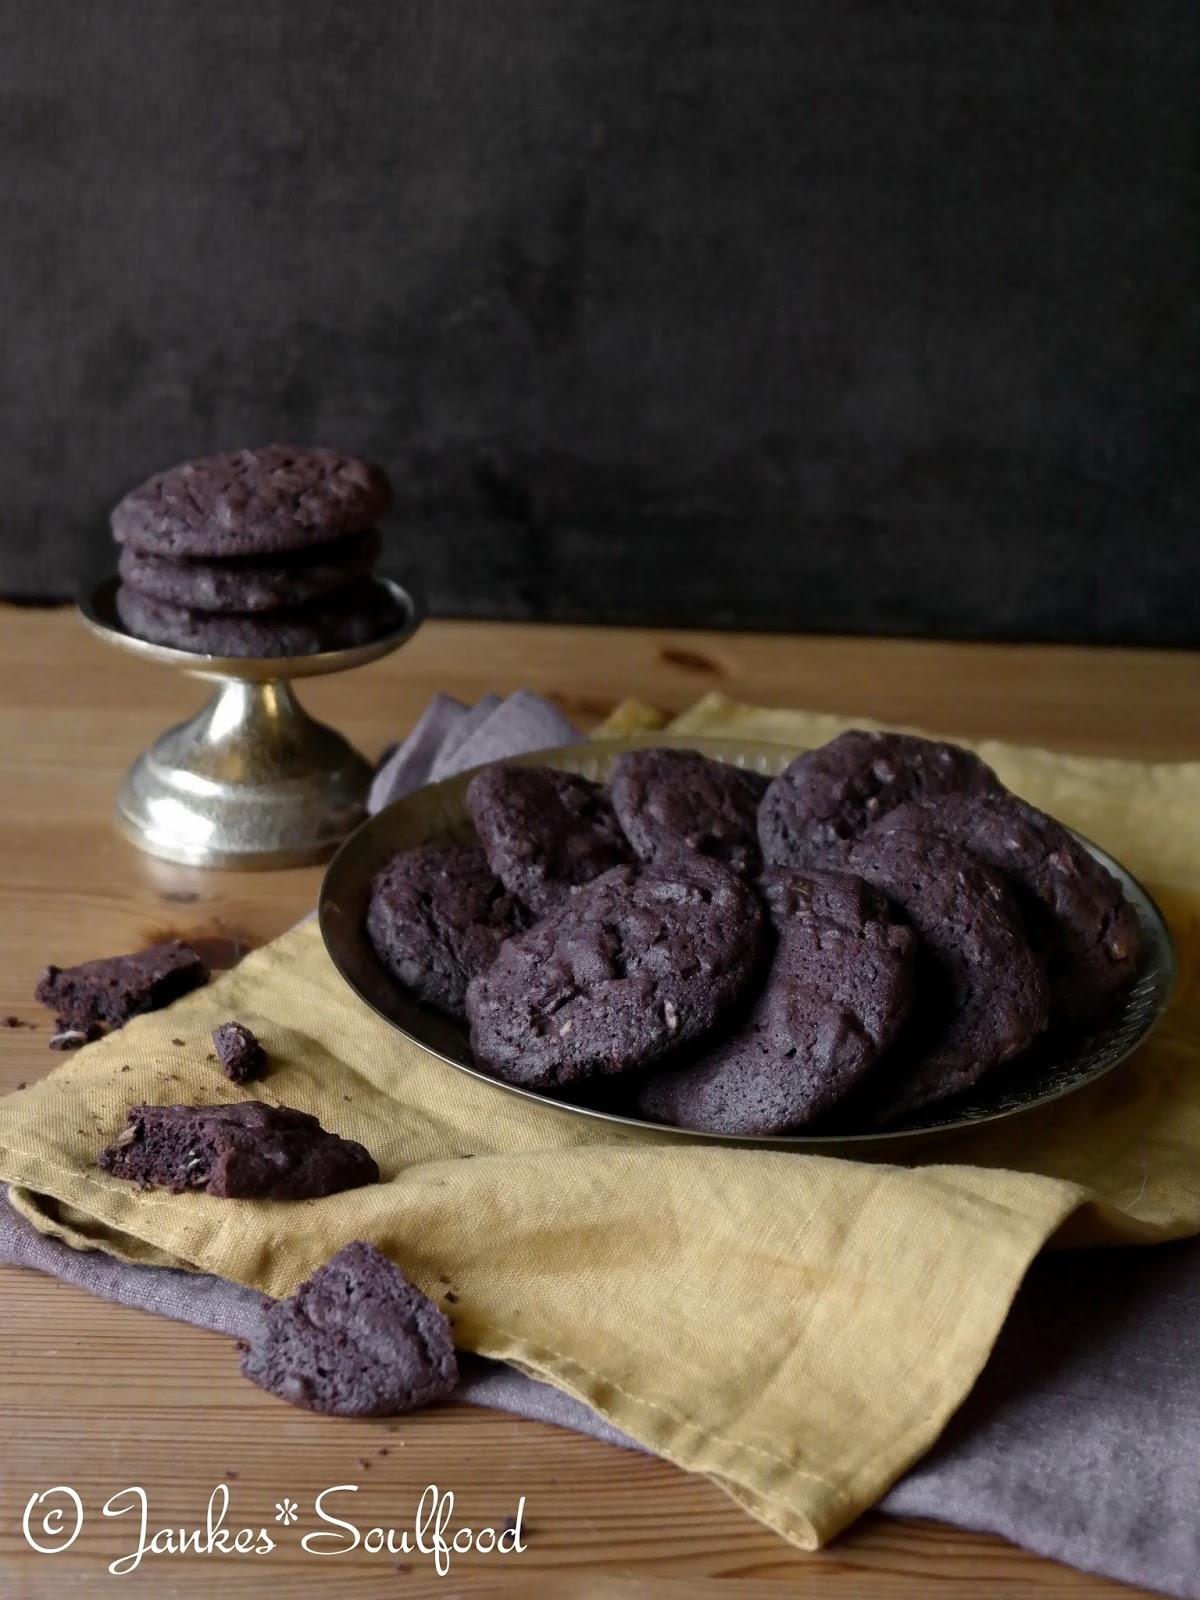 Schoko-Cookies von Jankes Soulfood